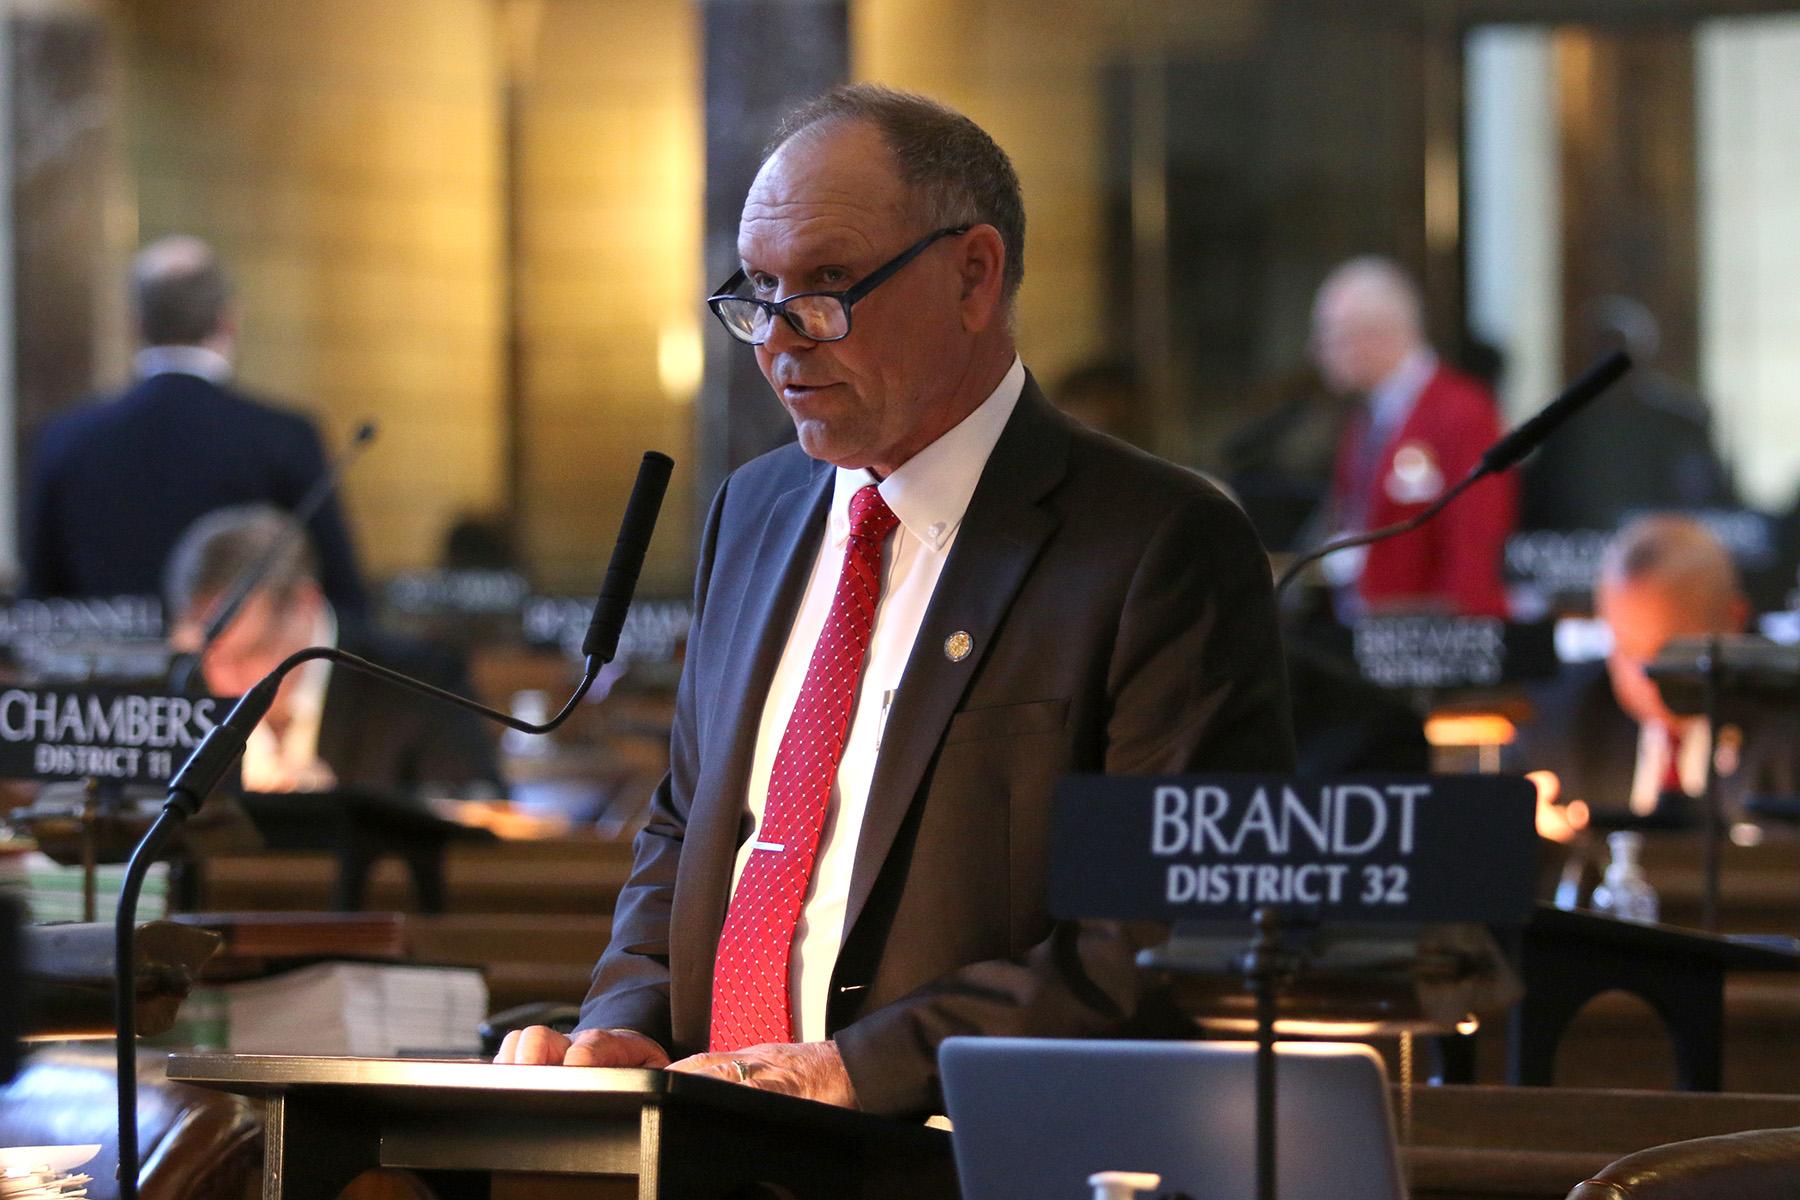 Senator Tom Brandt at the Nebraska Capitol